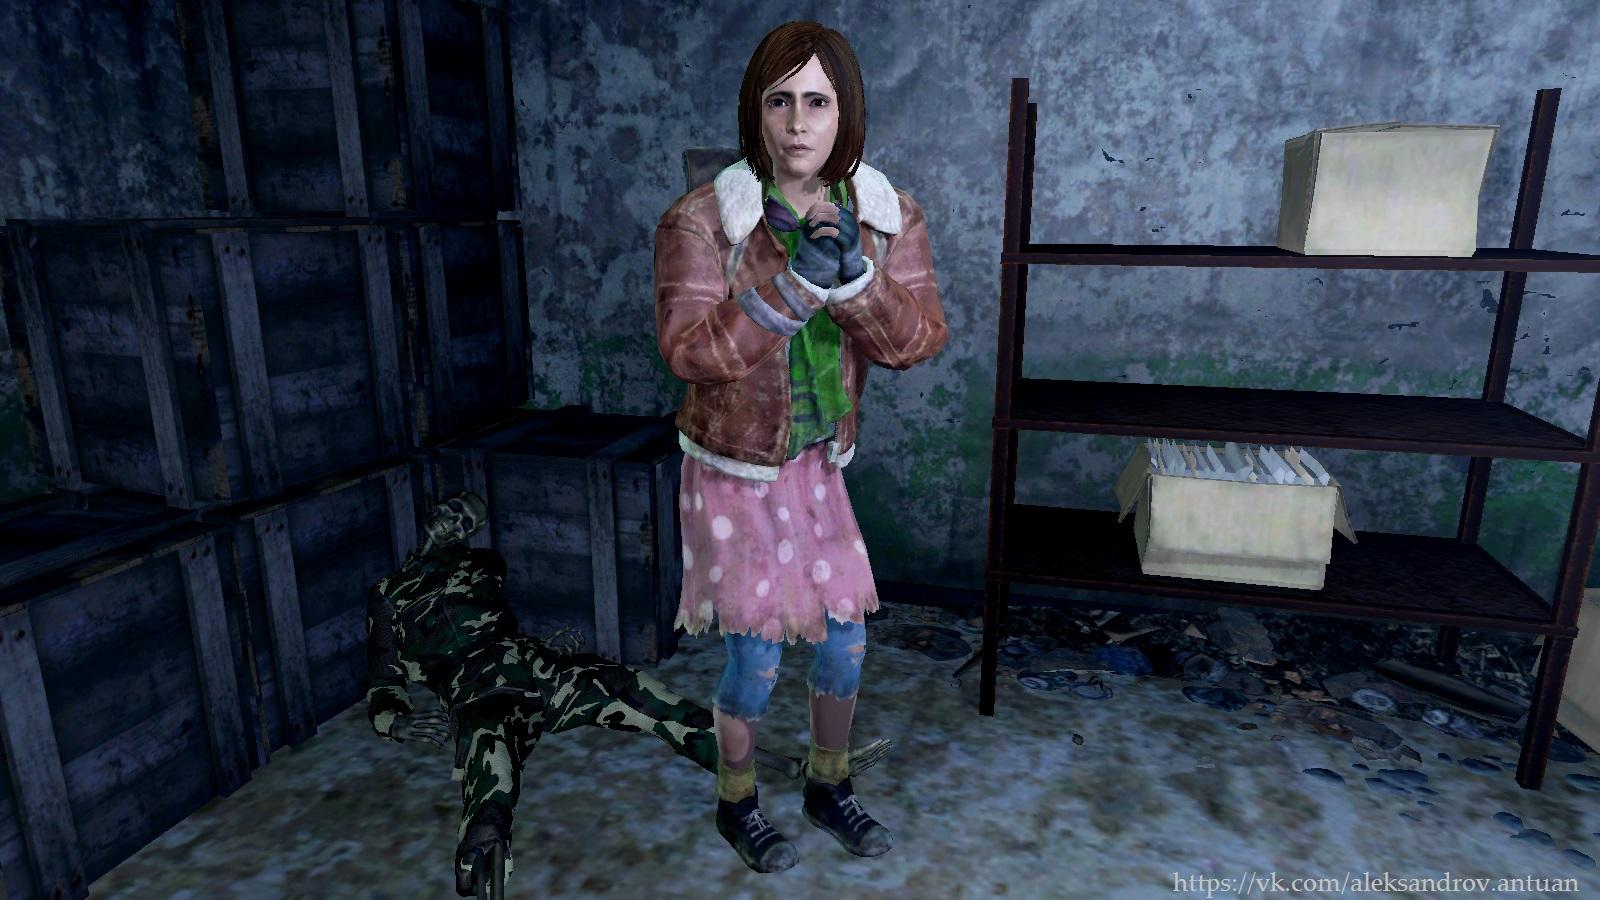 - Пощадите, добрый сеньор !.. - Fallout 4 Orphans of the Commonwealth, одежда Нат, Оливия, сирота, сироты Содружества